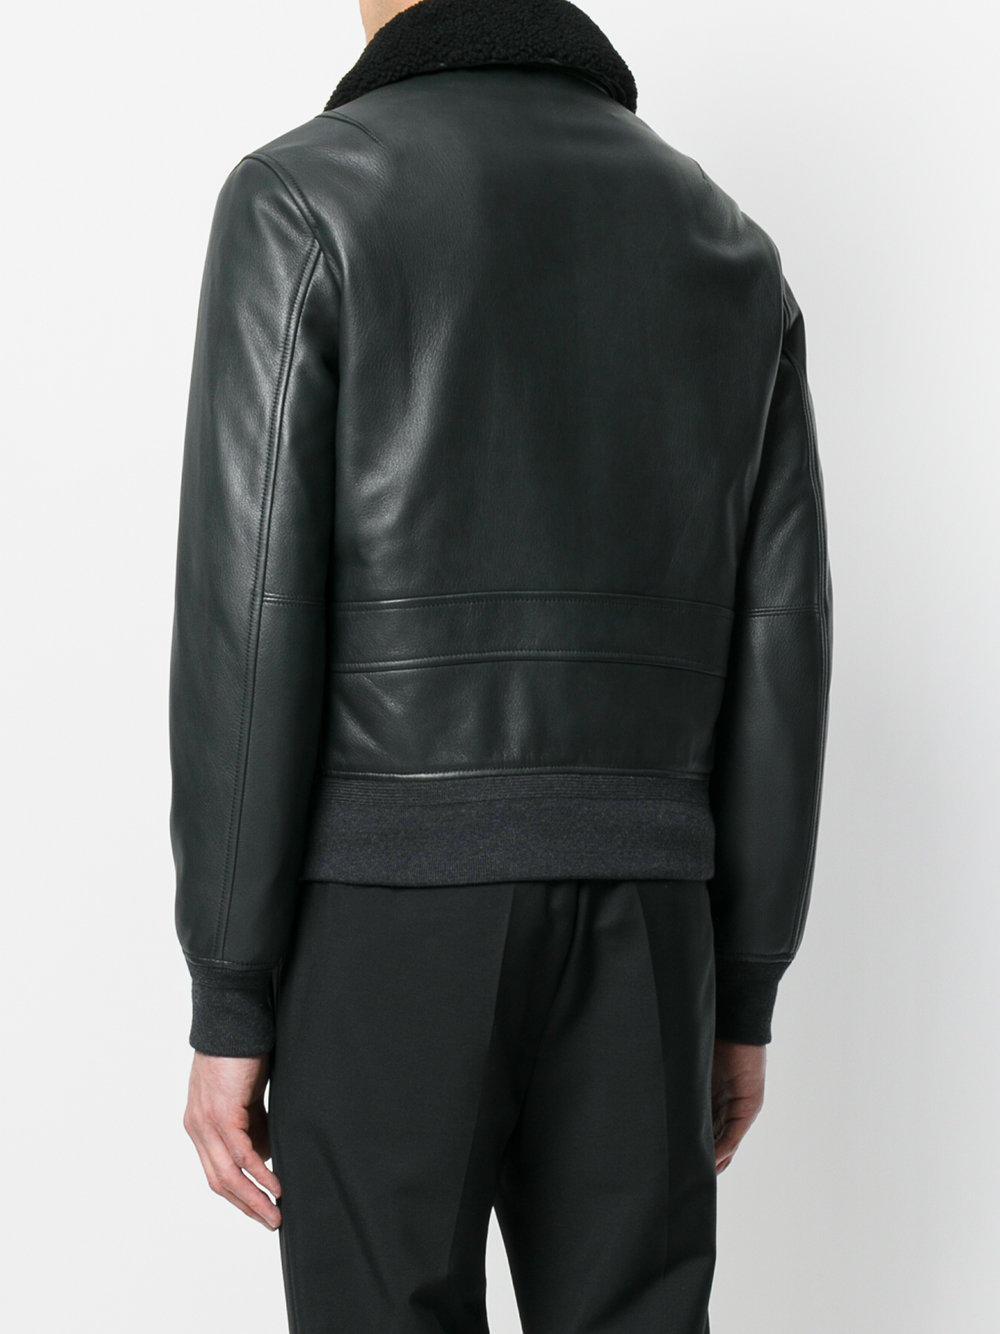 Alexander McQueen Leather Zipped Bomber Jacket in Black for Men